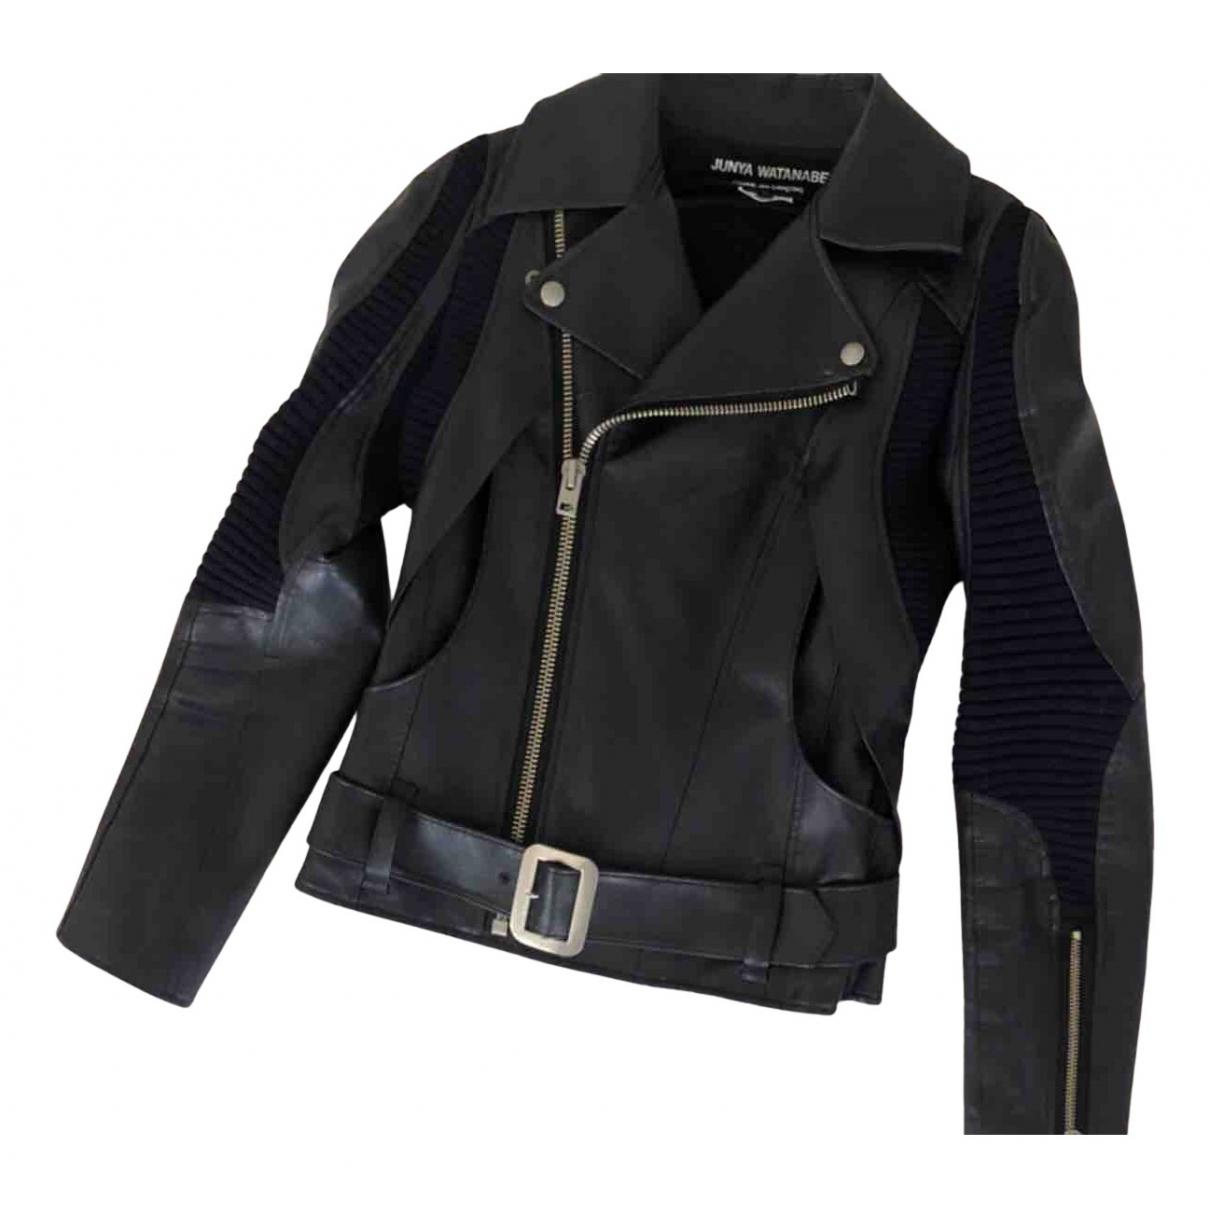 Junya Watanabe N Black Leather Leather jacket for Women S International